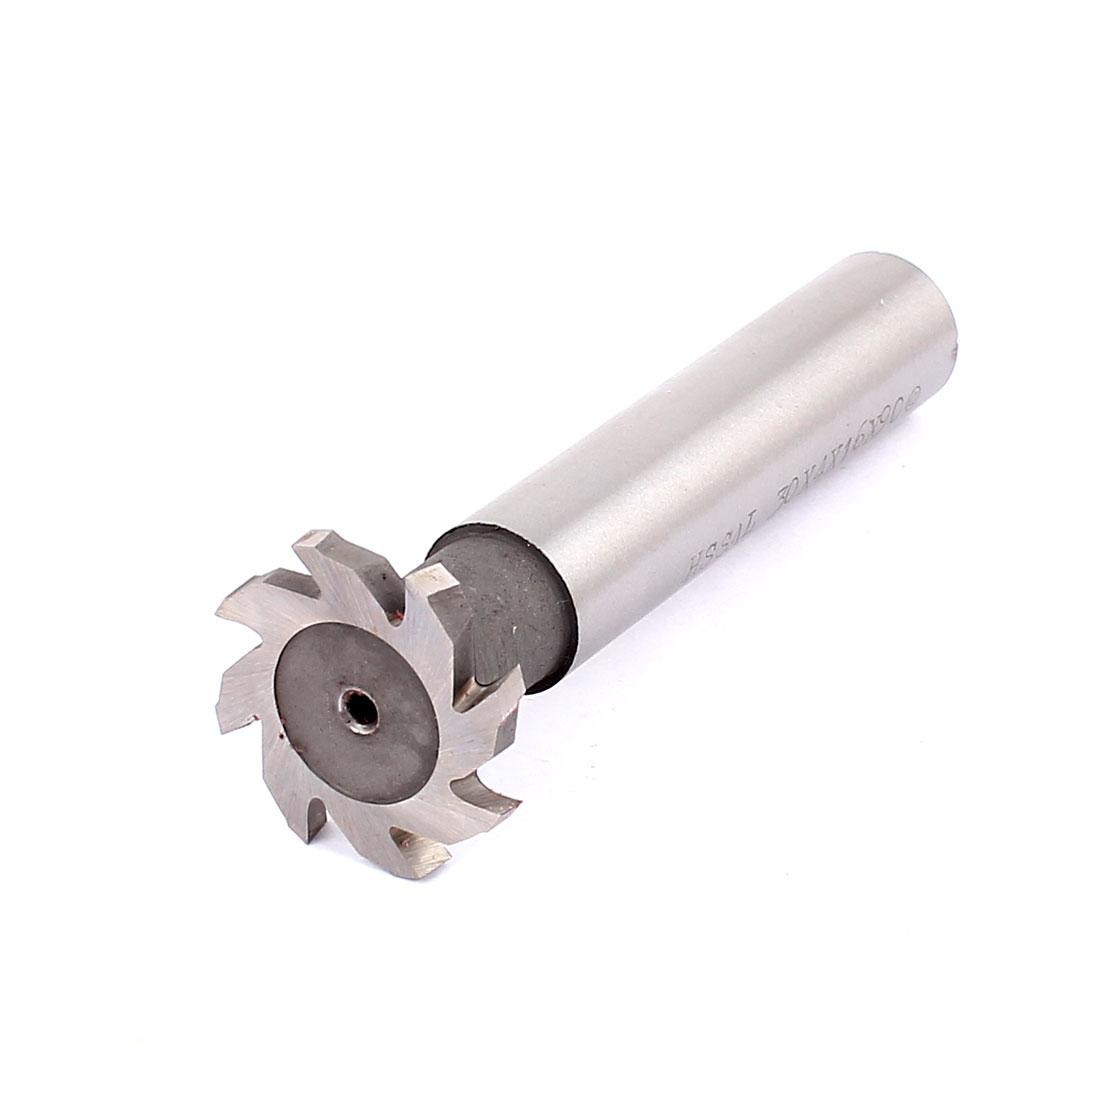 30mm Cutting Dia 4mm Depth 8 Flutes HSS-AL T Slot End Mill Milling Cutter